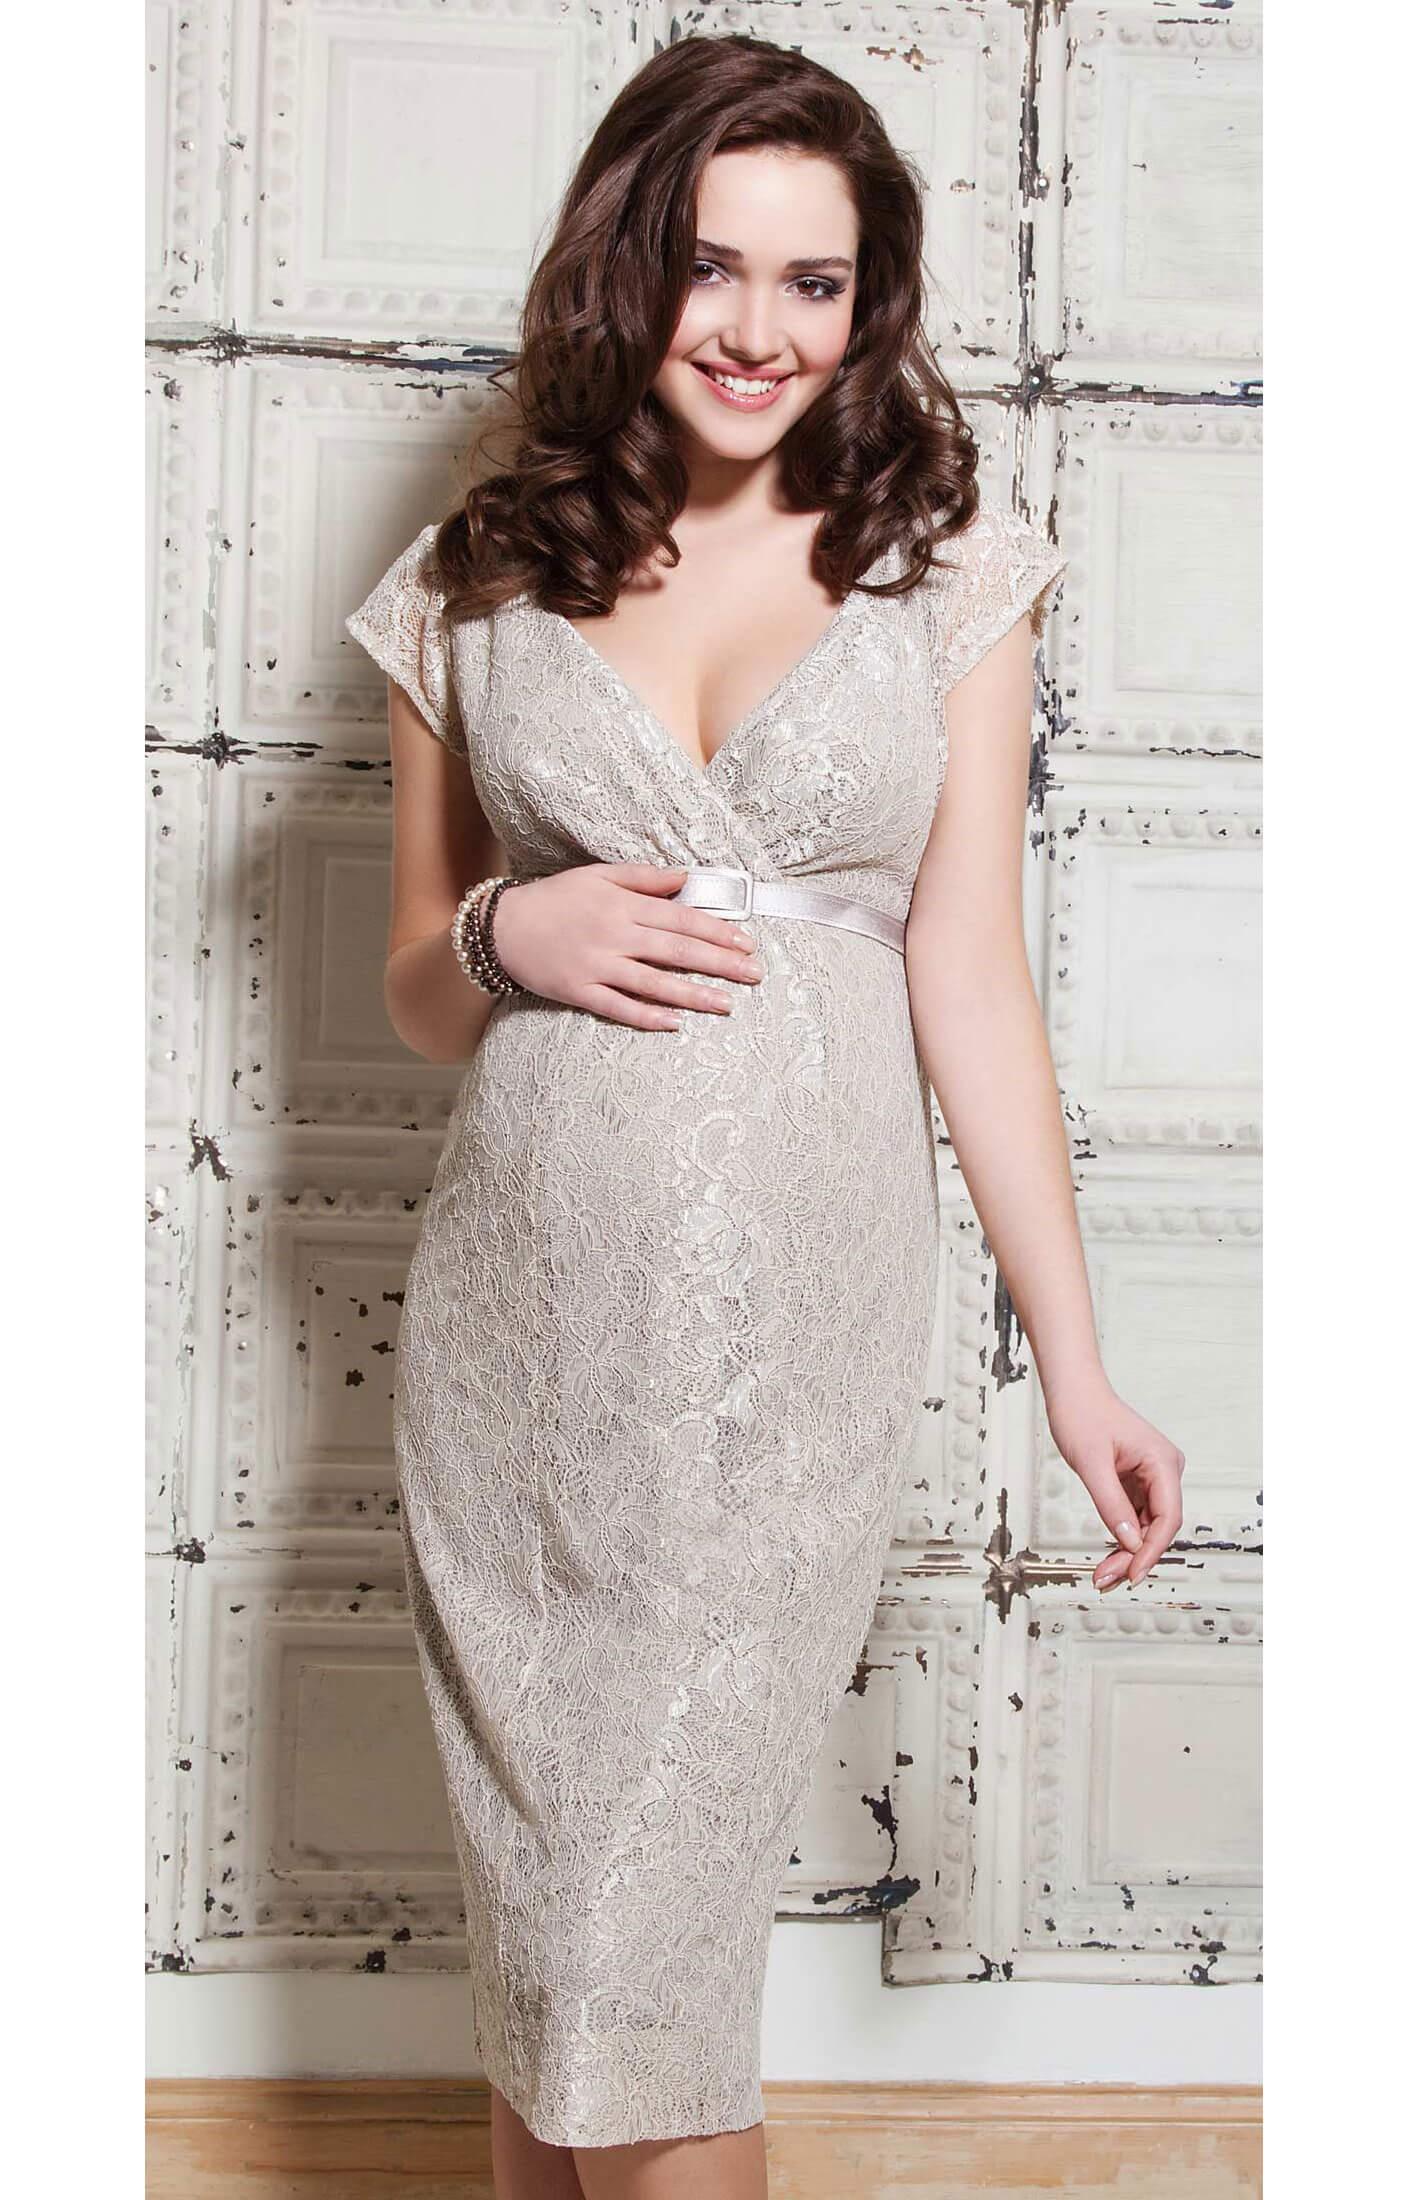 Evelyn Maternity Dress (Champagne Beige) beige wedding dress Evelyn Maternity Dress Champagne Beige by Tiffany Rose